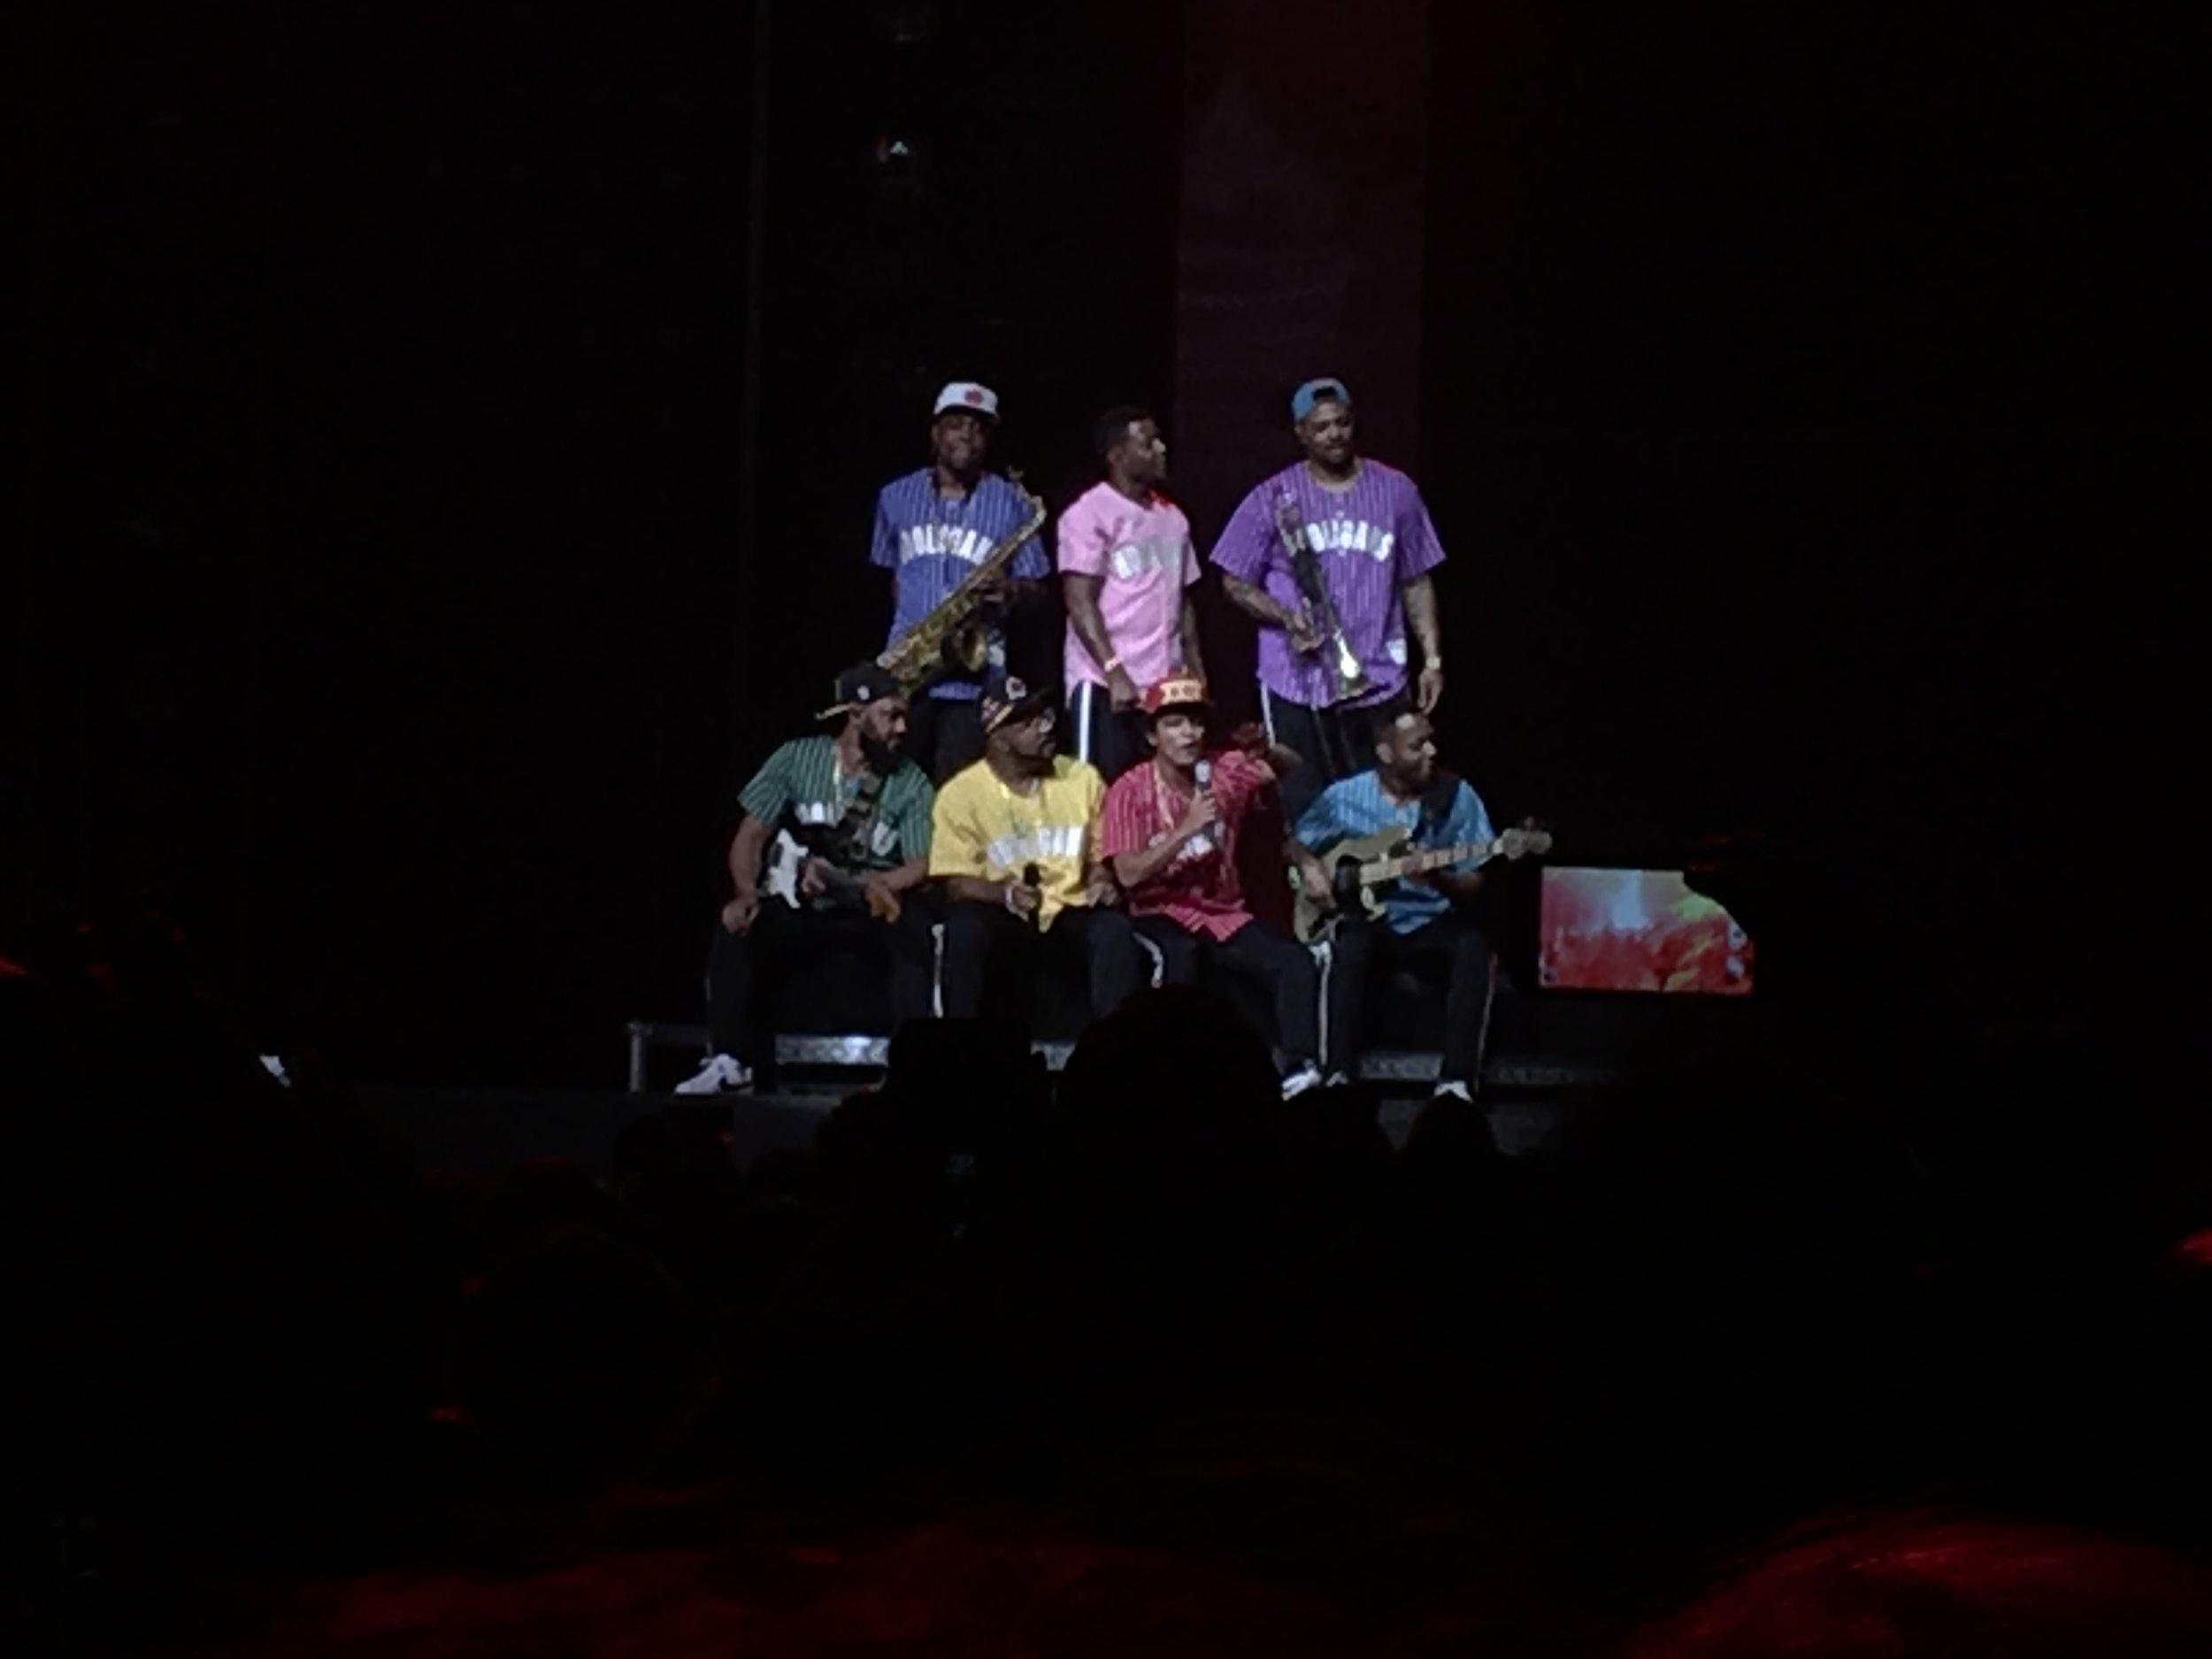 Bruno & The Hooligans